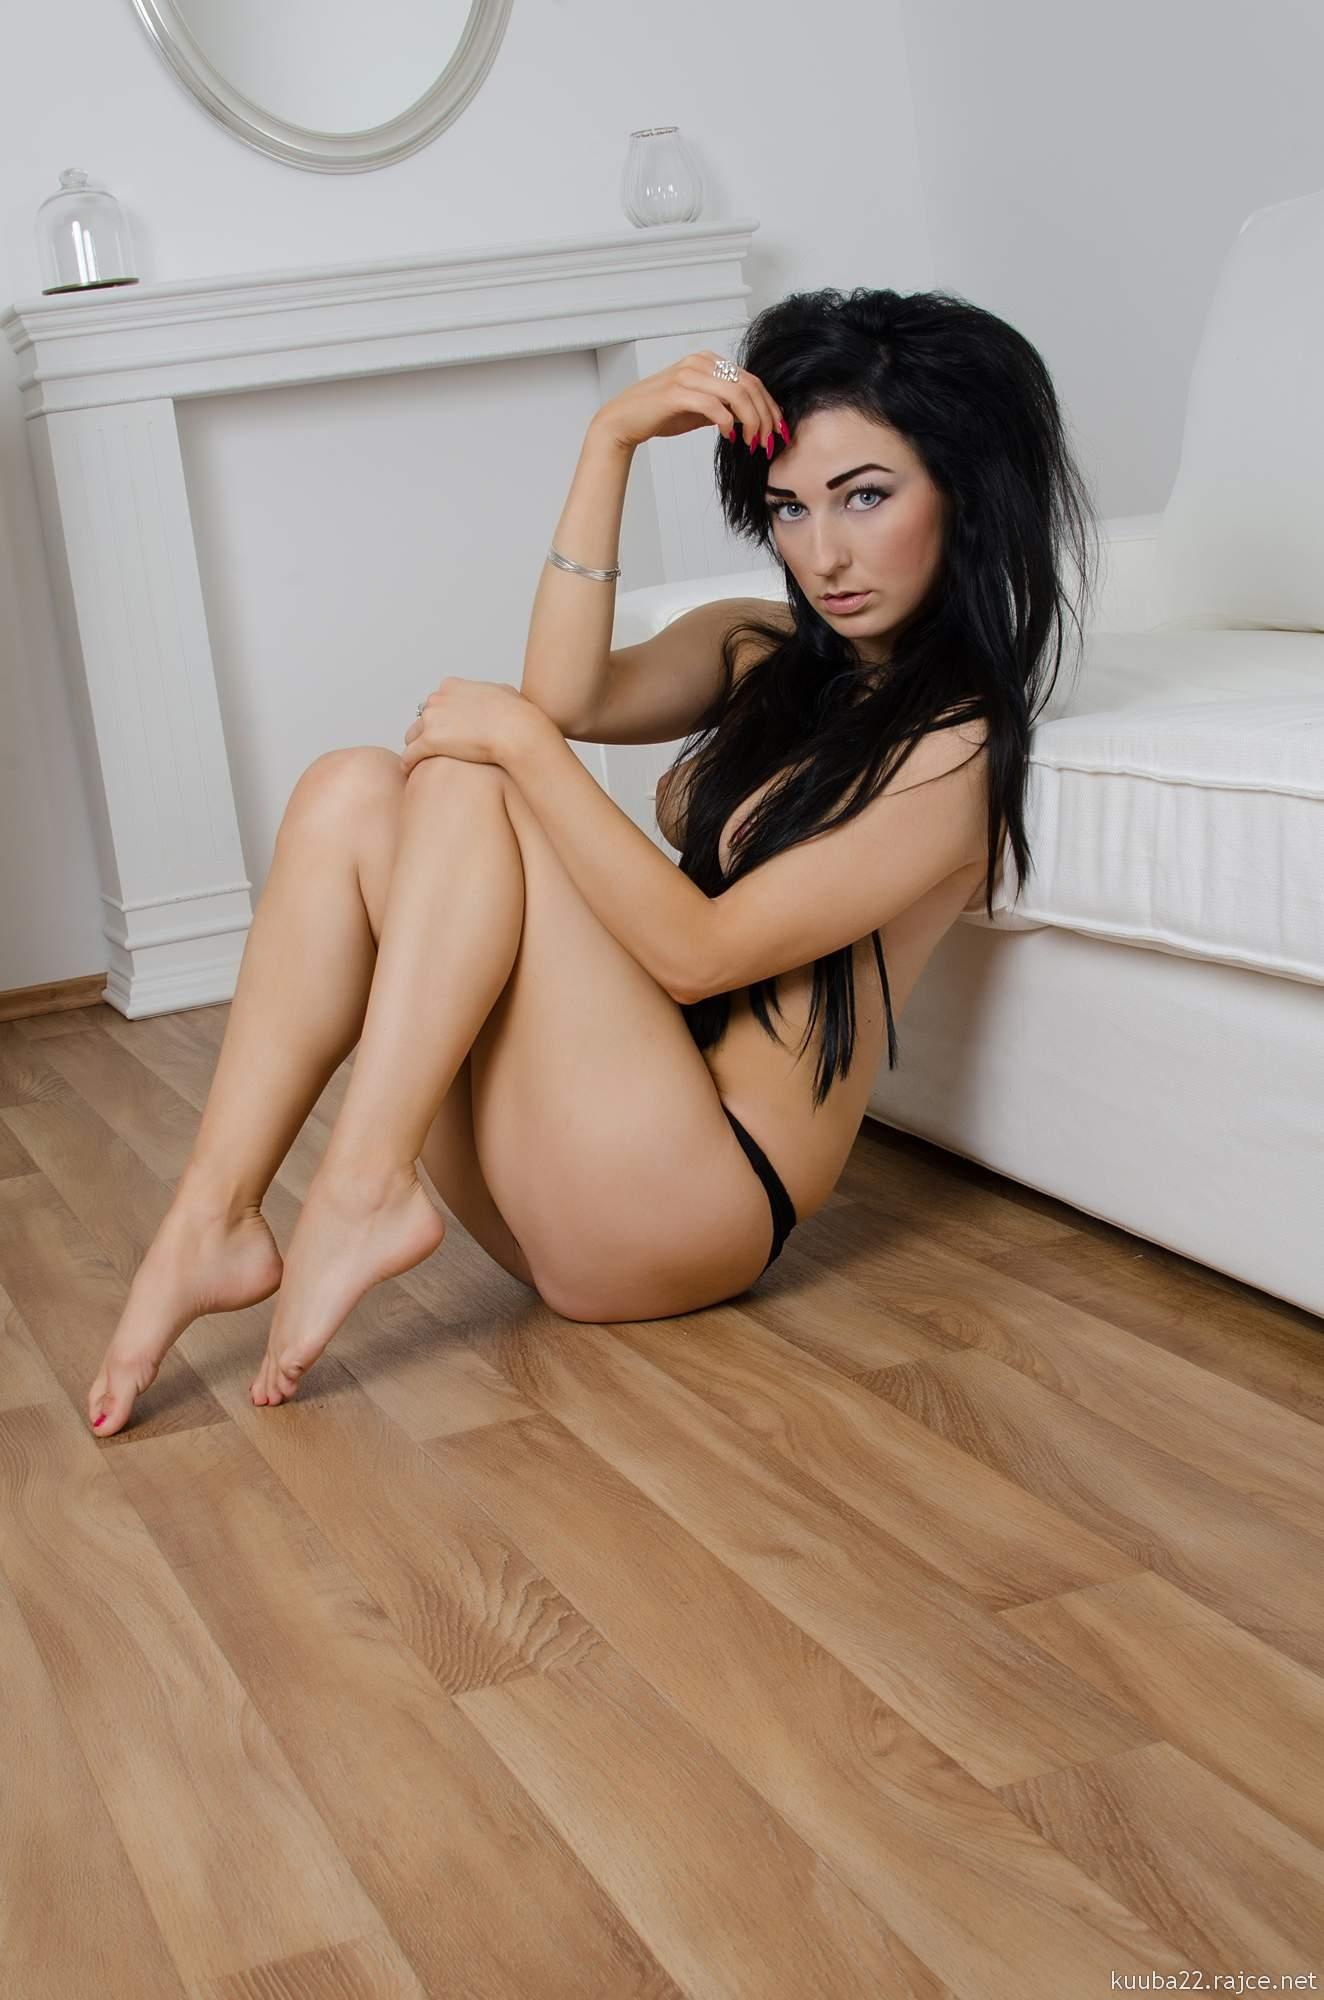 http://img20.rajce.idnes.cz/d2003/12/12061/12061162_45d55d8a31720e051679fc95e701ca88/images/DSC0386.jpg